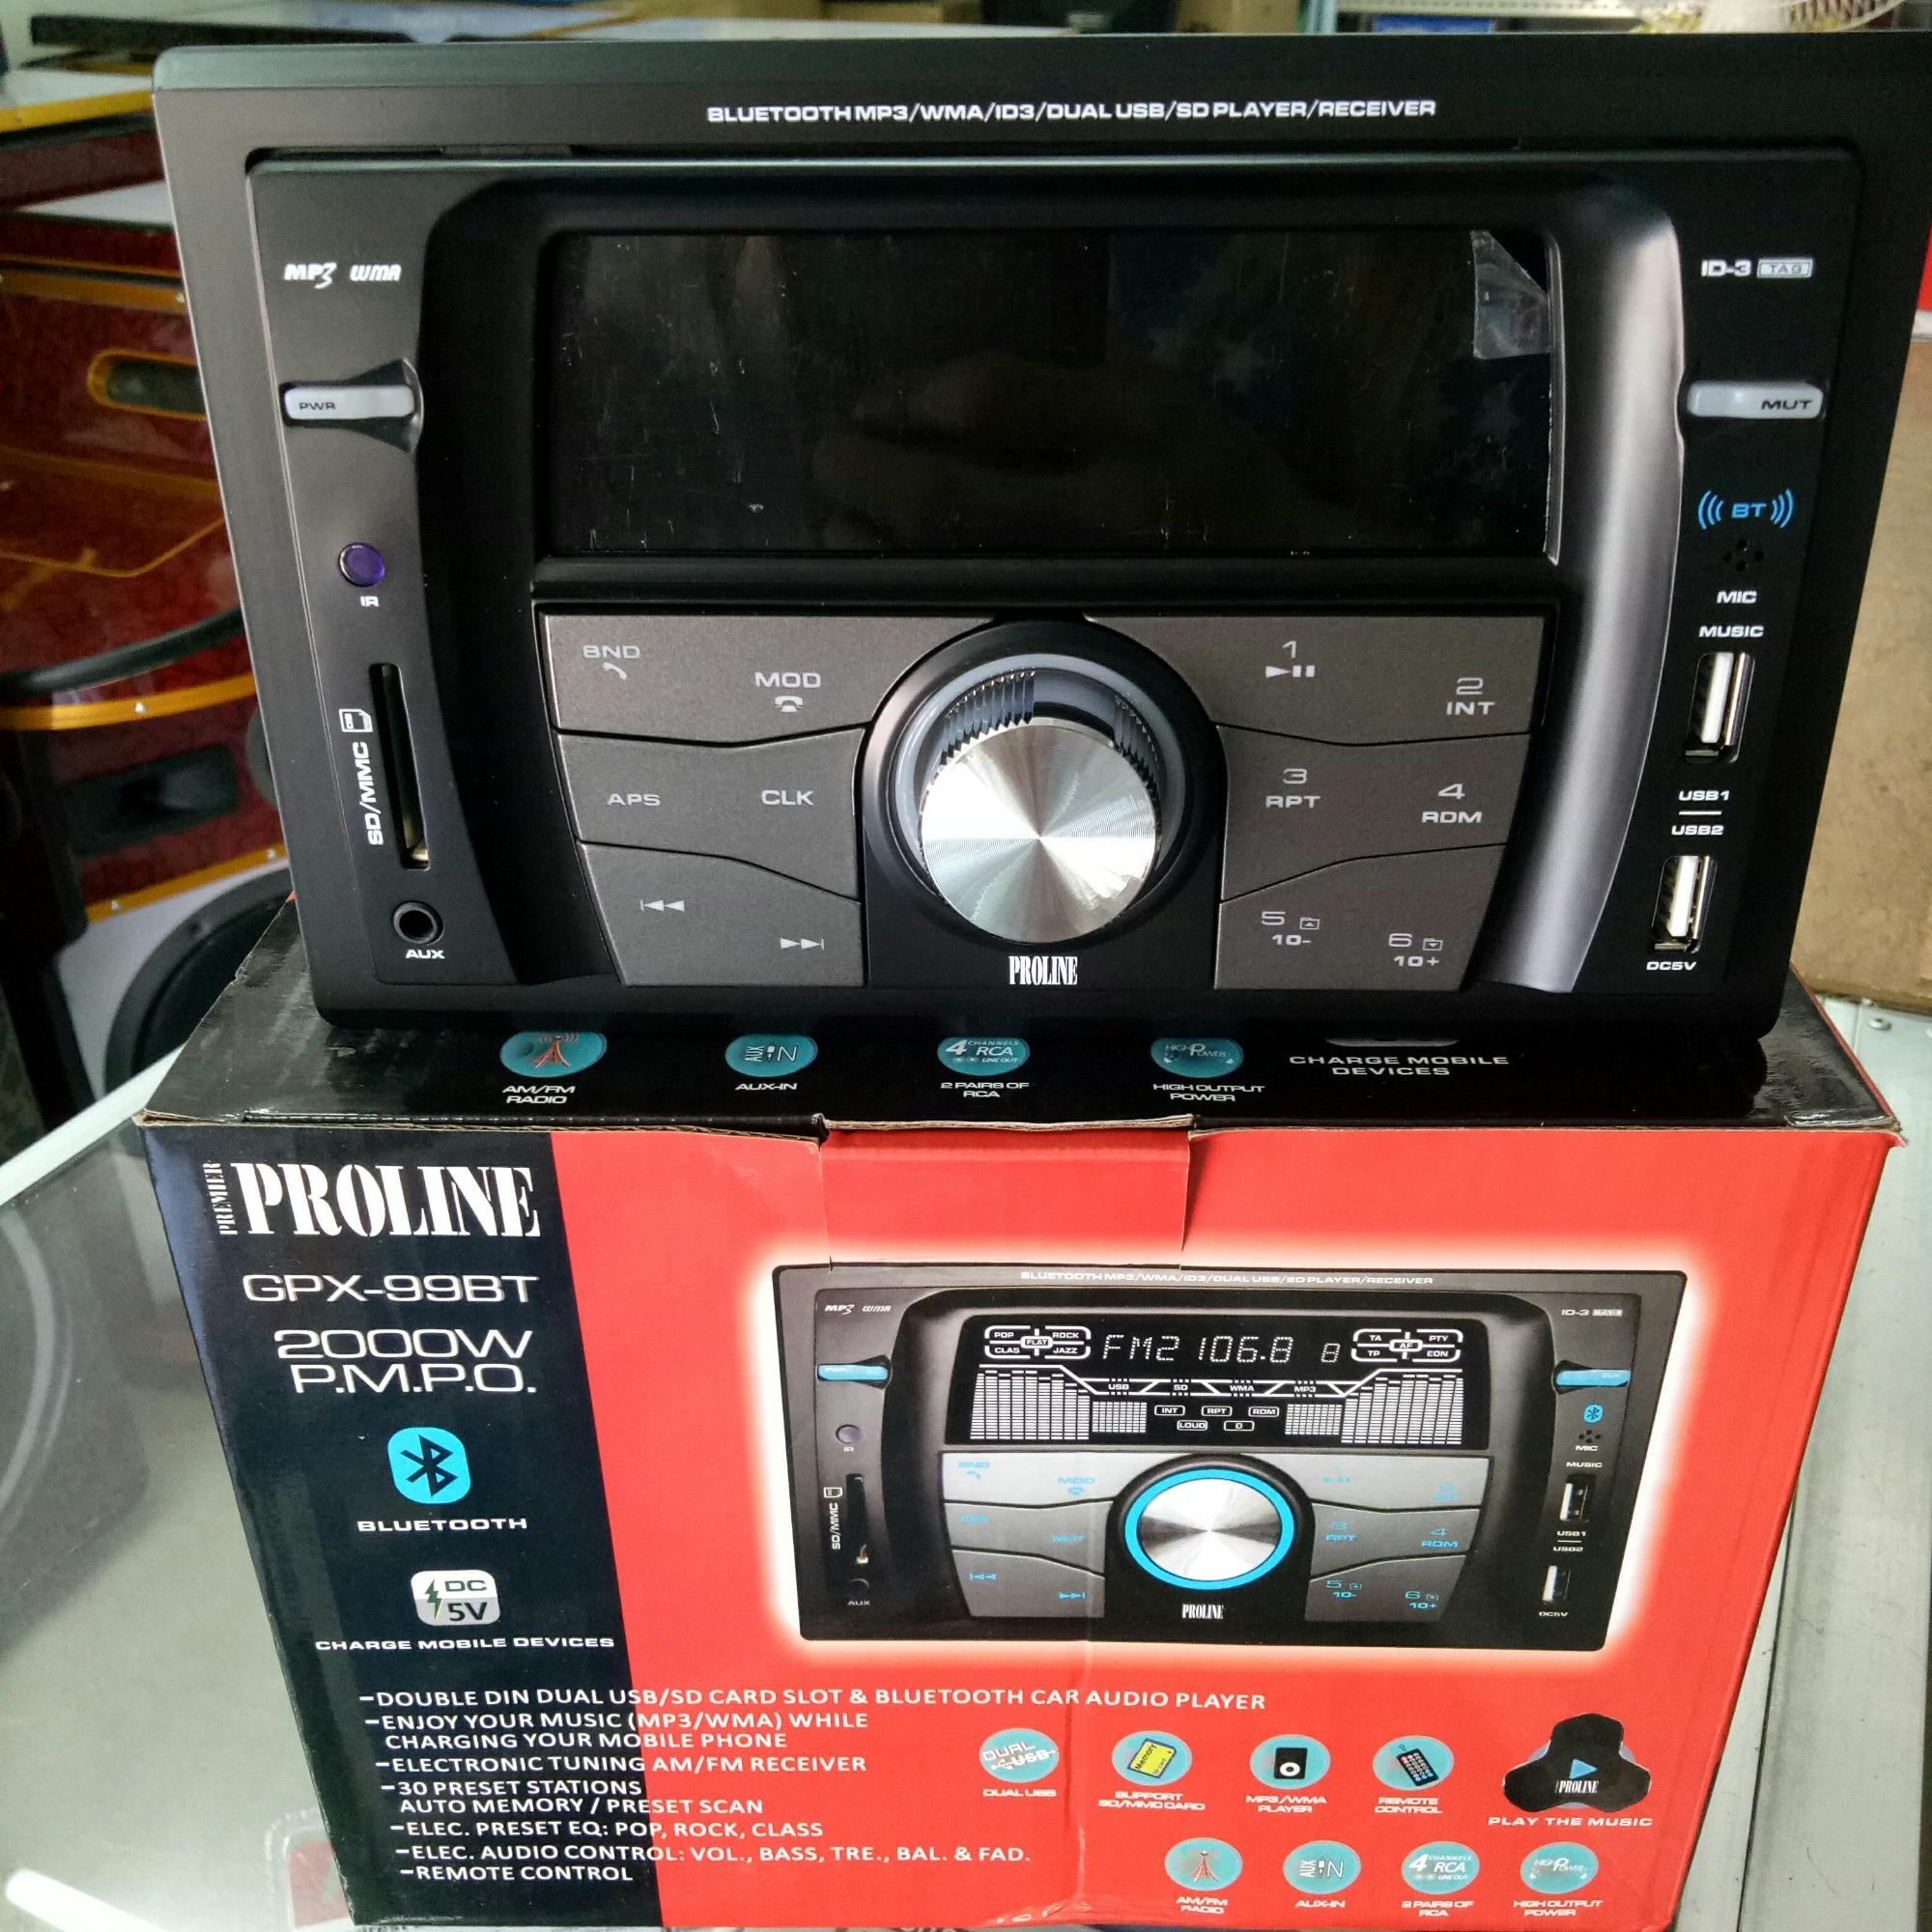 Proline GPX-99BT 2 Din Car Stereo w/ Bluetooth, Radio, USB/SD Card Slot